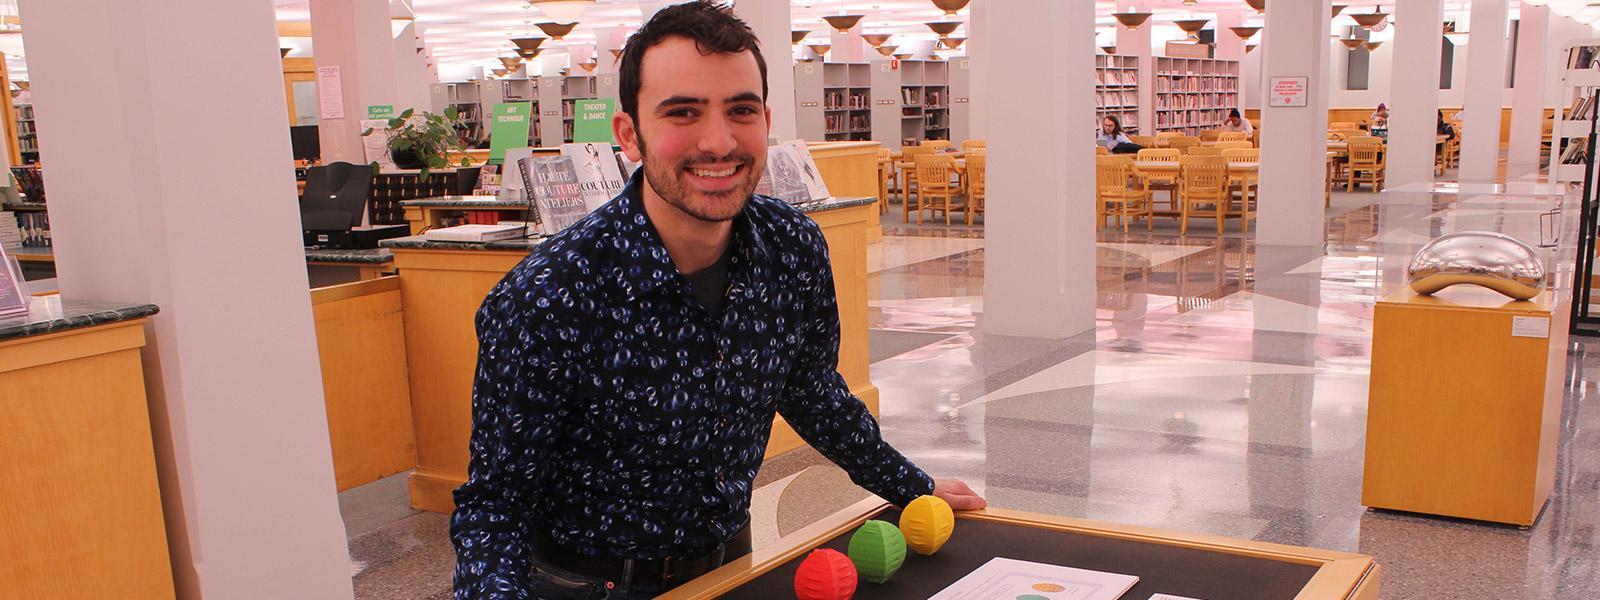 Visual Arts alumnus makes health an art form | READ MORE >>